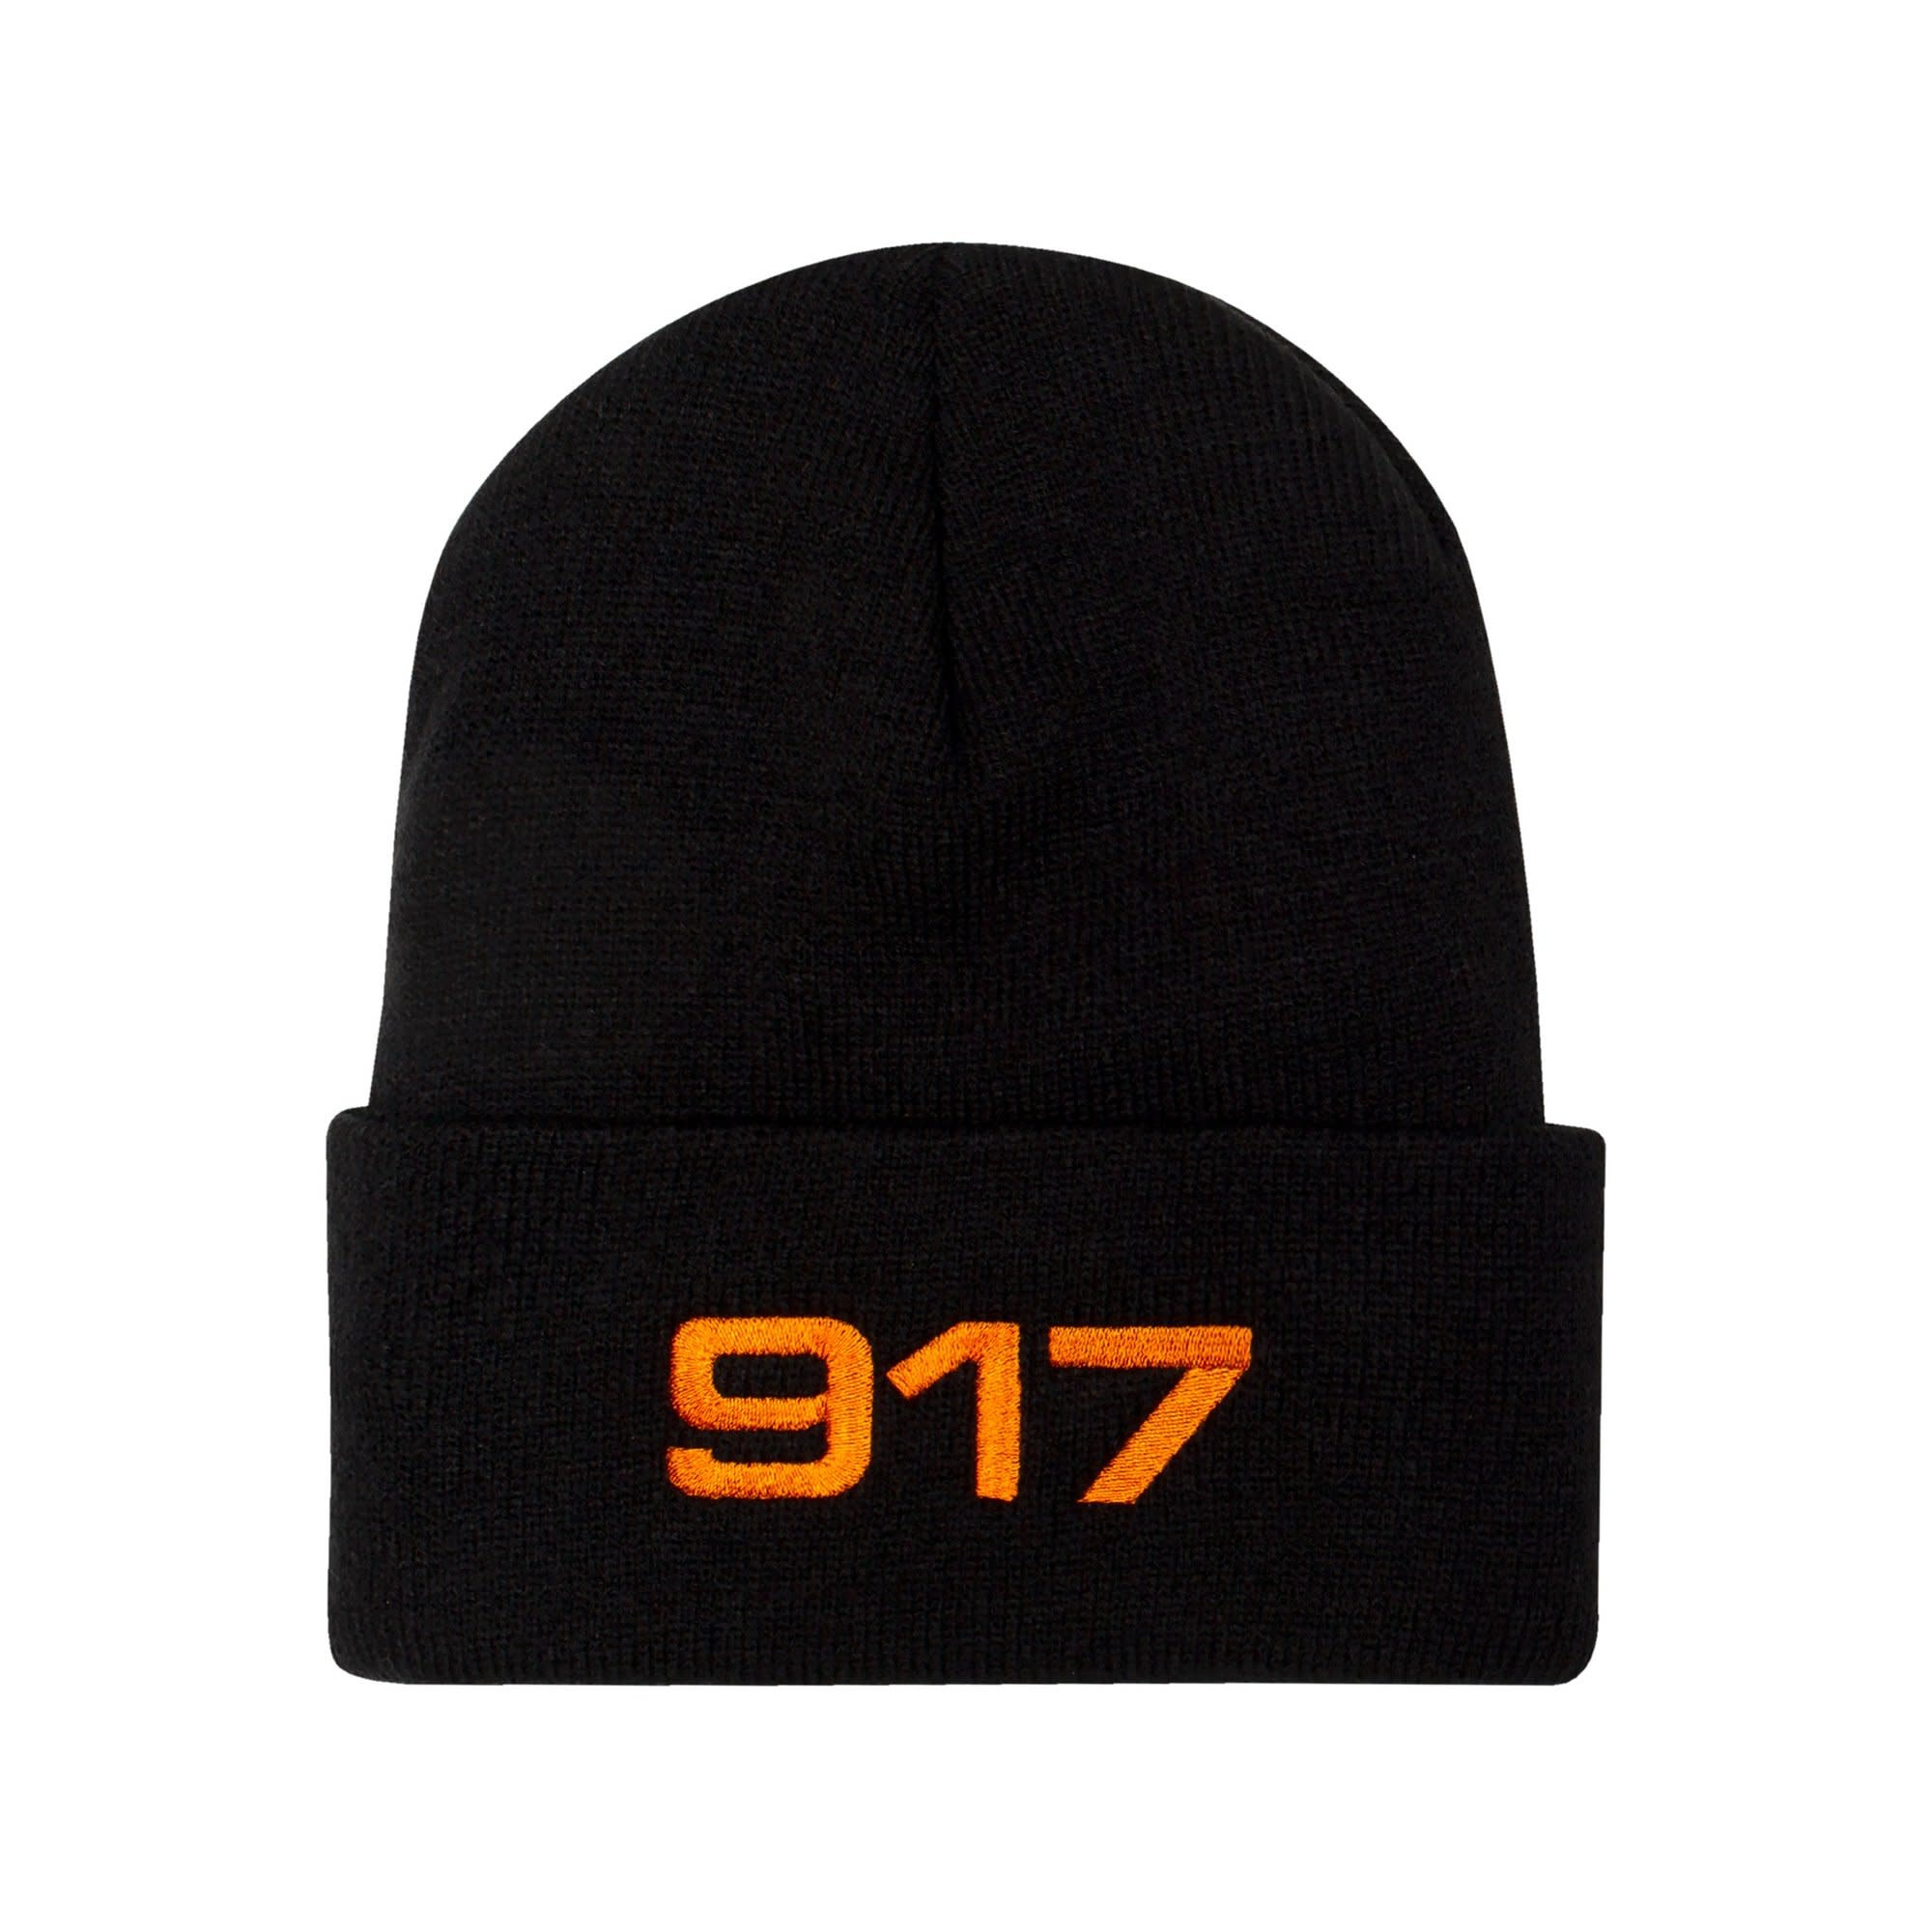 CallMe917 917 Racing Beanie Black/Orange